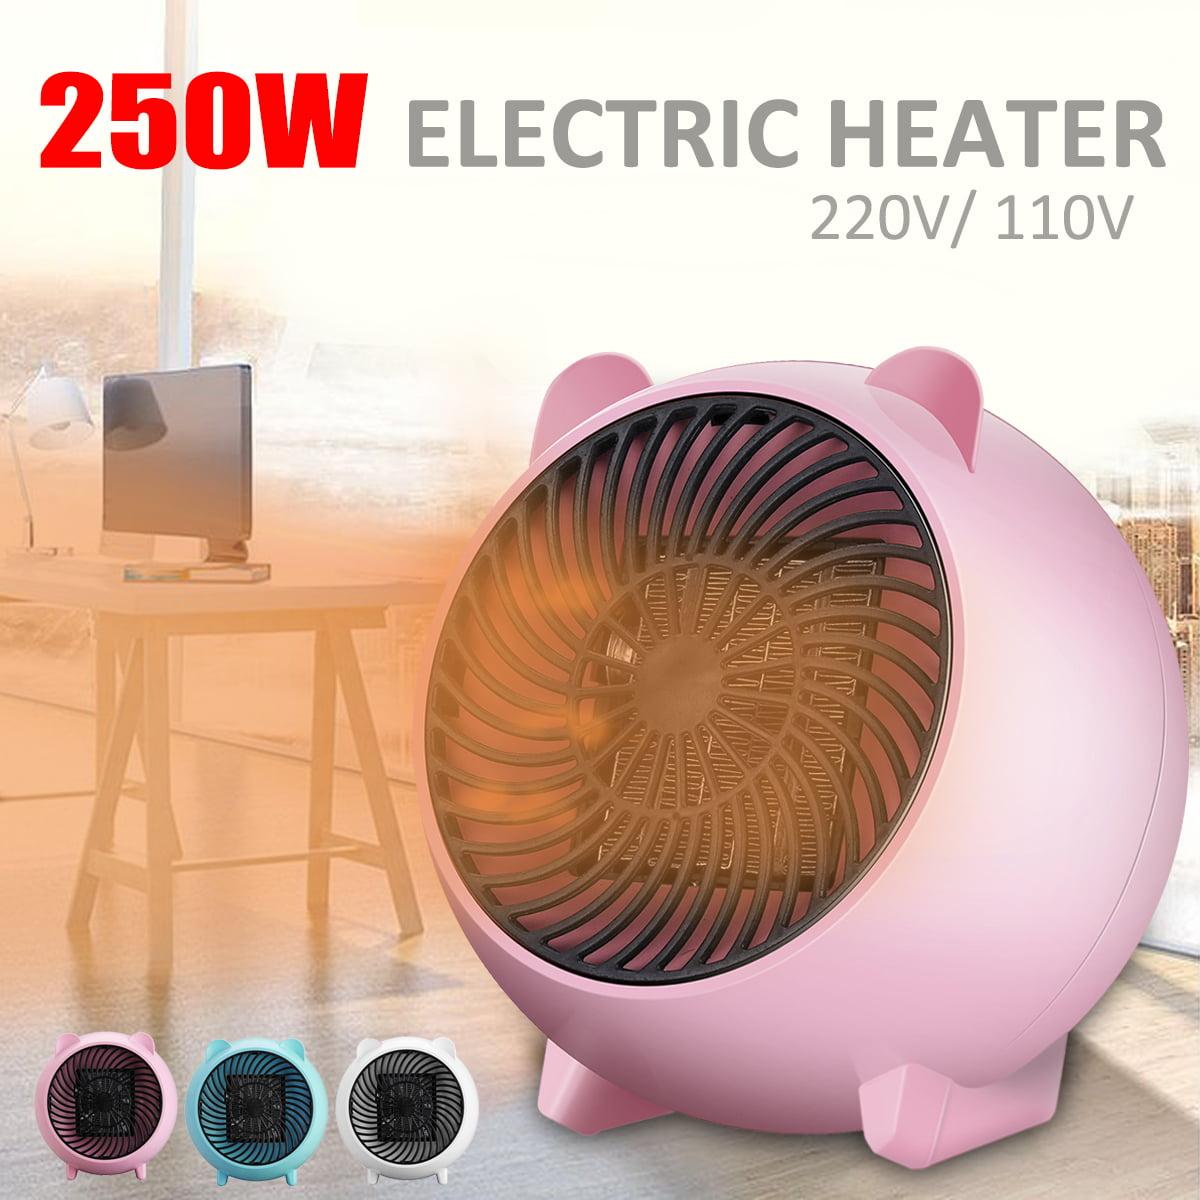 250W 10㎡ Heater Office Mini Desktop Small Household Air Heater Electric Air Warmer Equipment